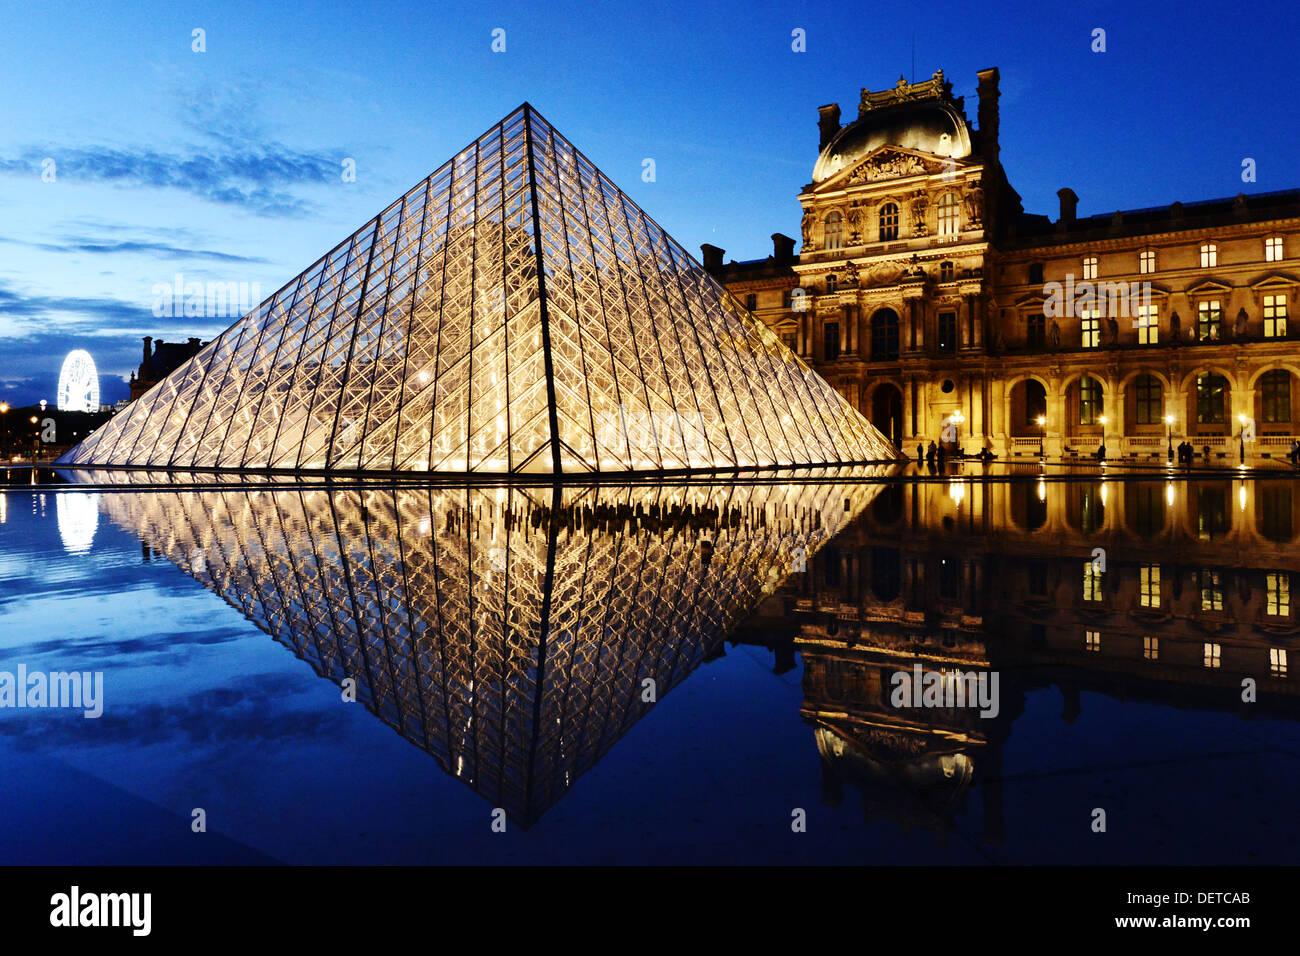 El Louvre o el Museo del Louvre, París, Francia. Foto de stock